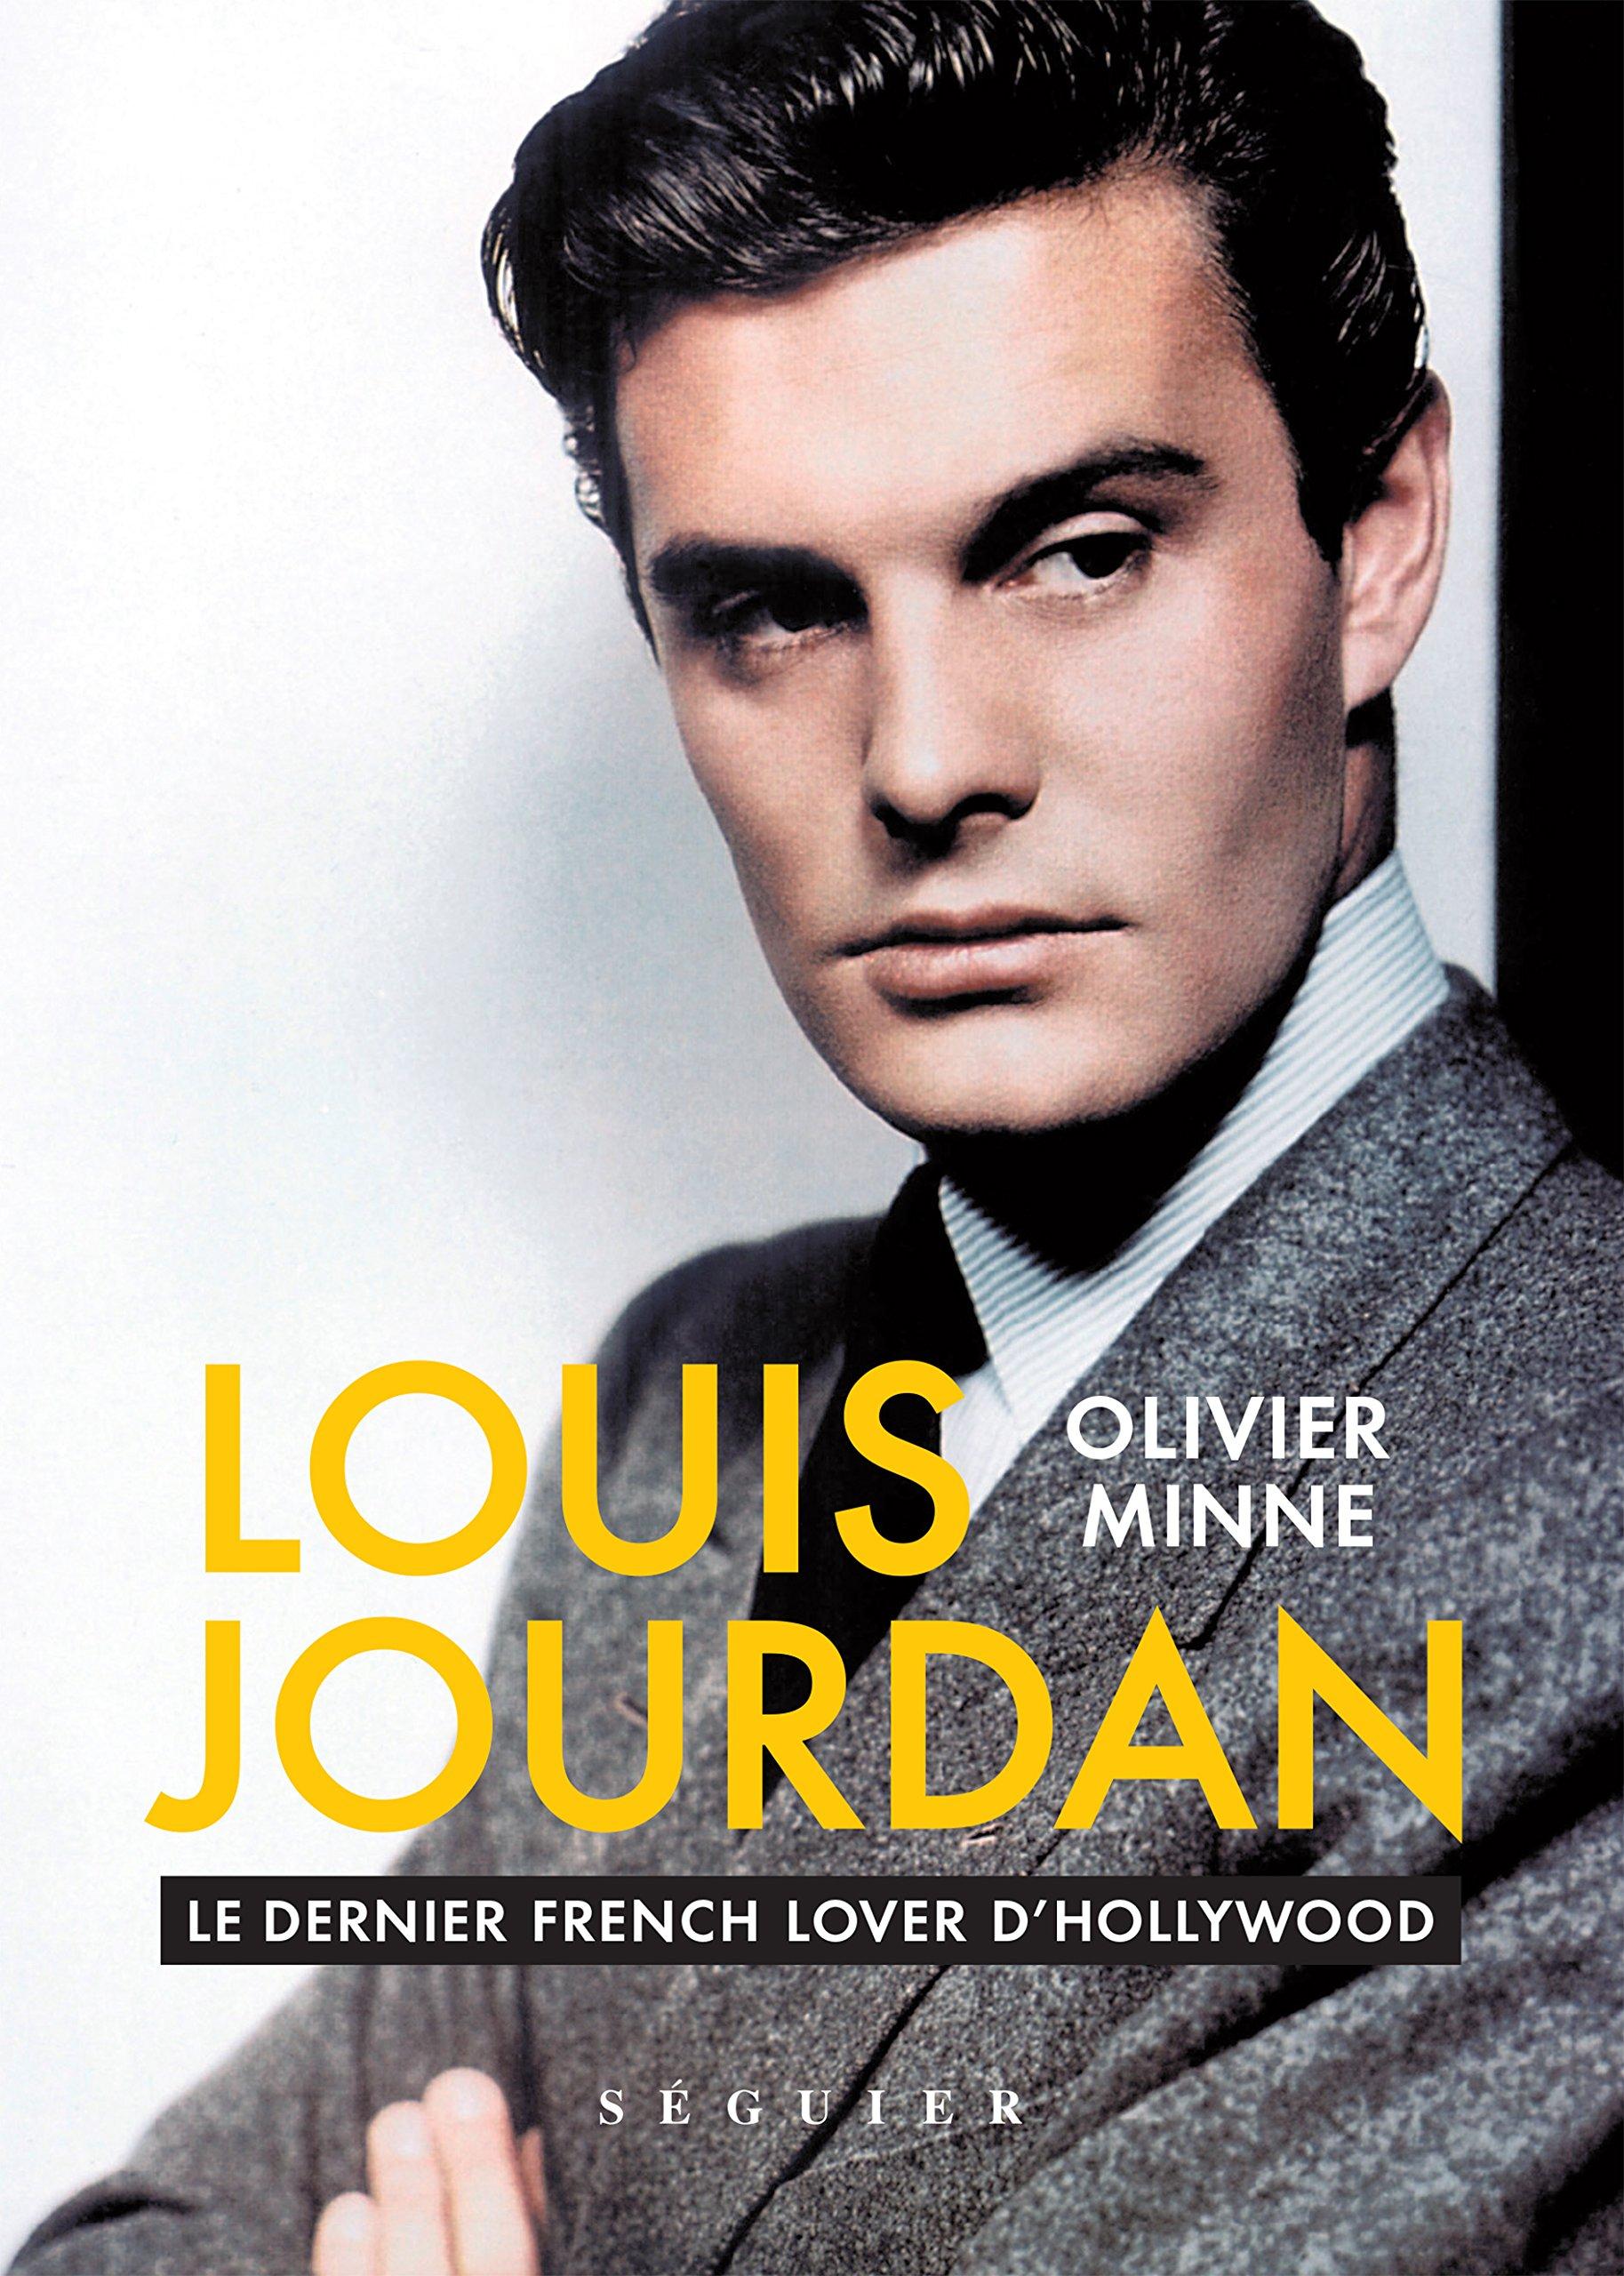 Louis Jourdan: Le dernier French lover d'Hollywood